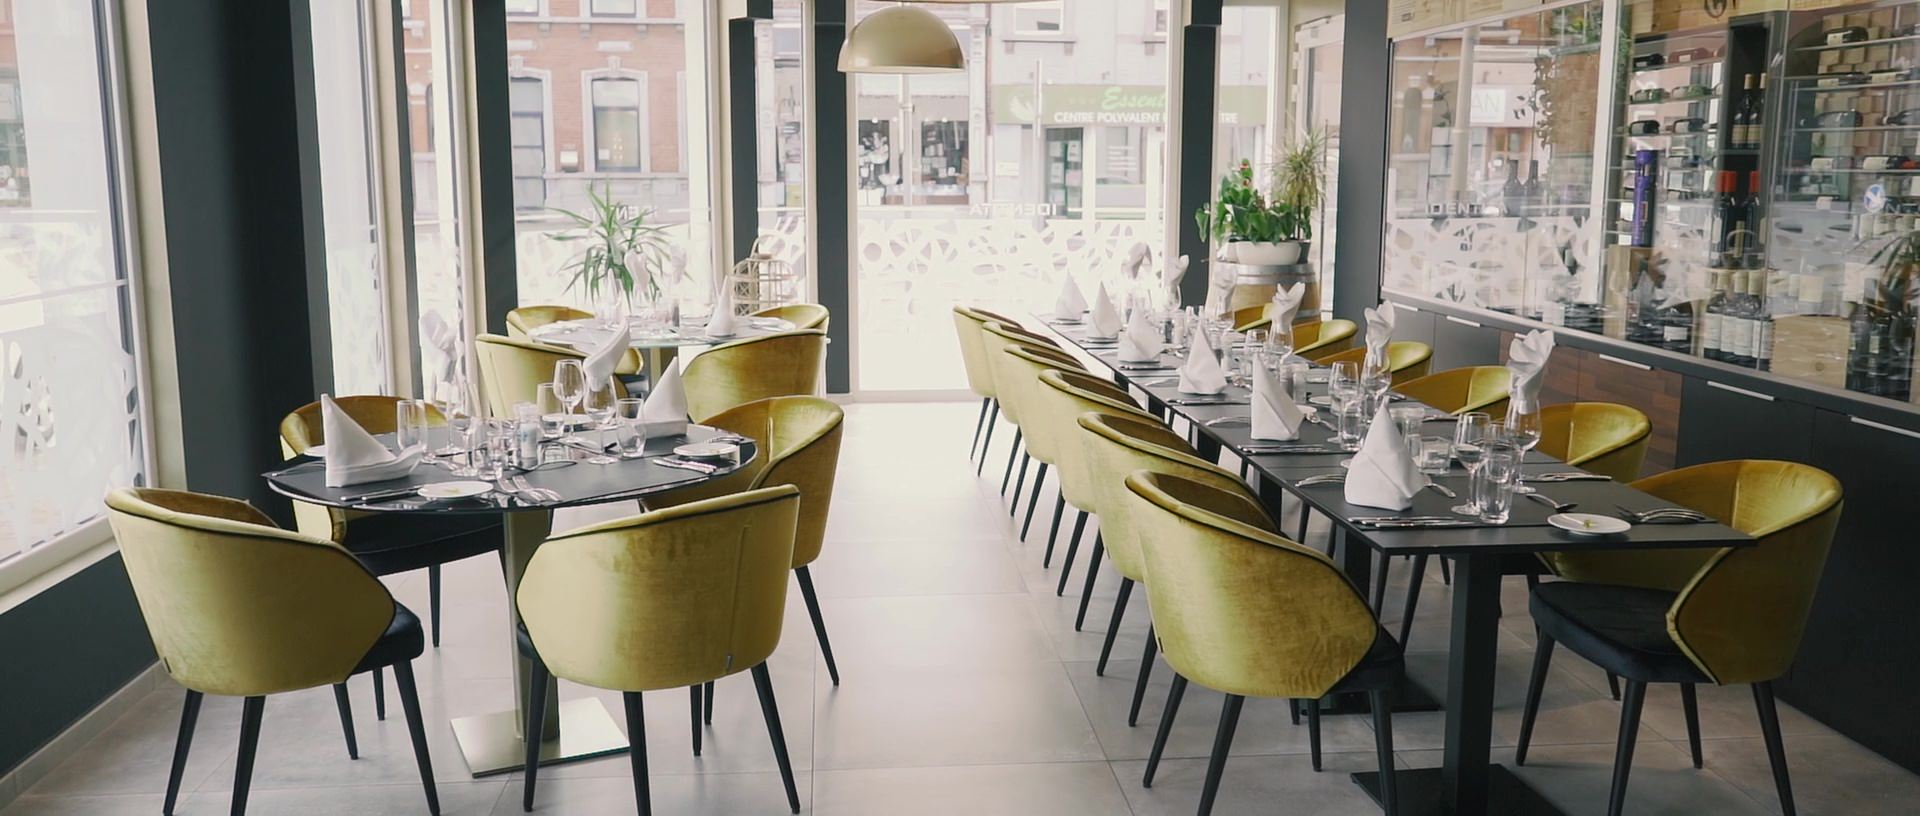 Identita Restaurant